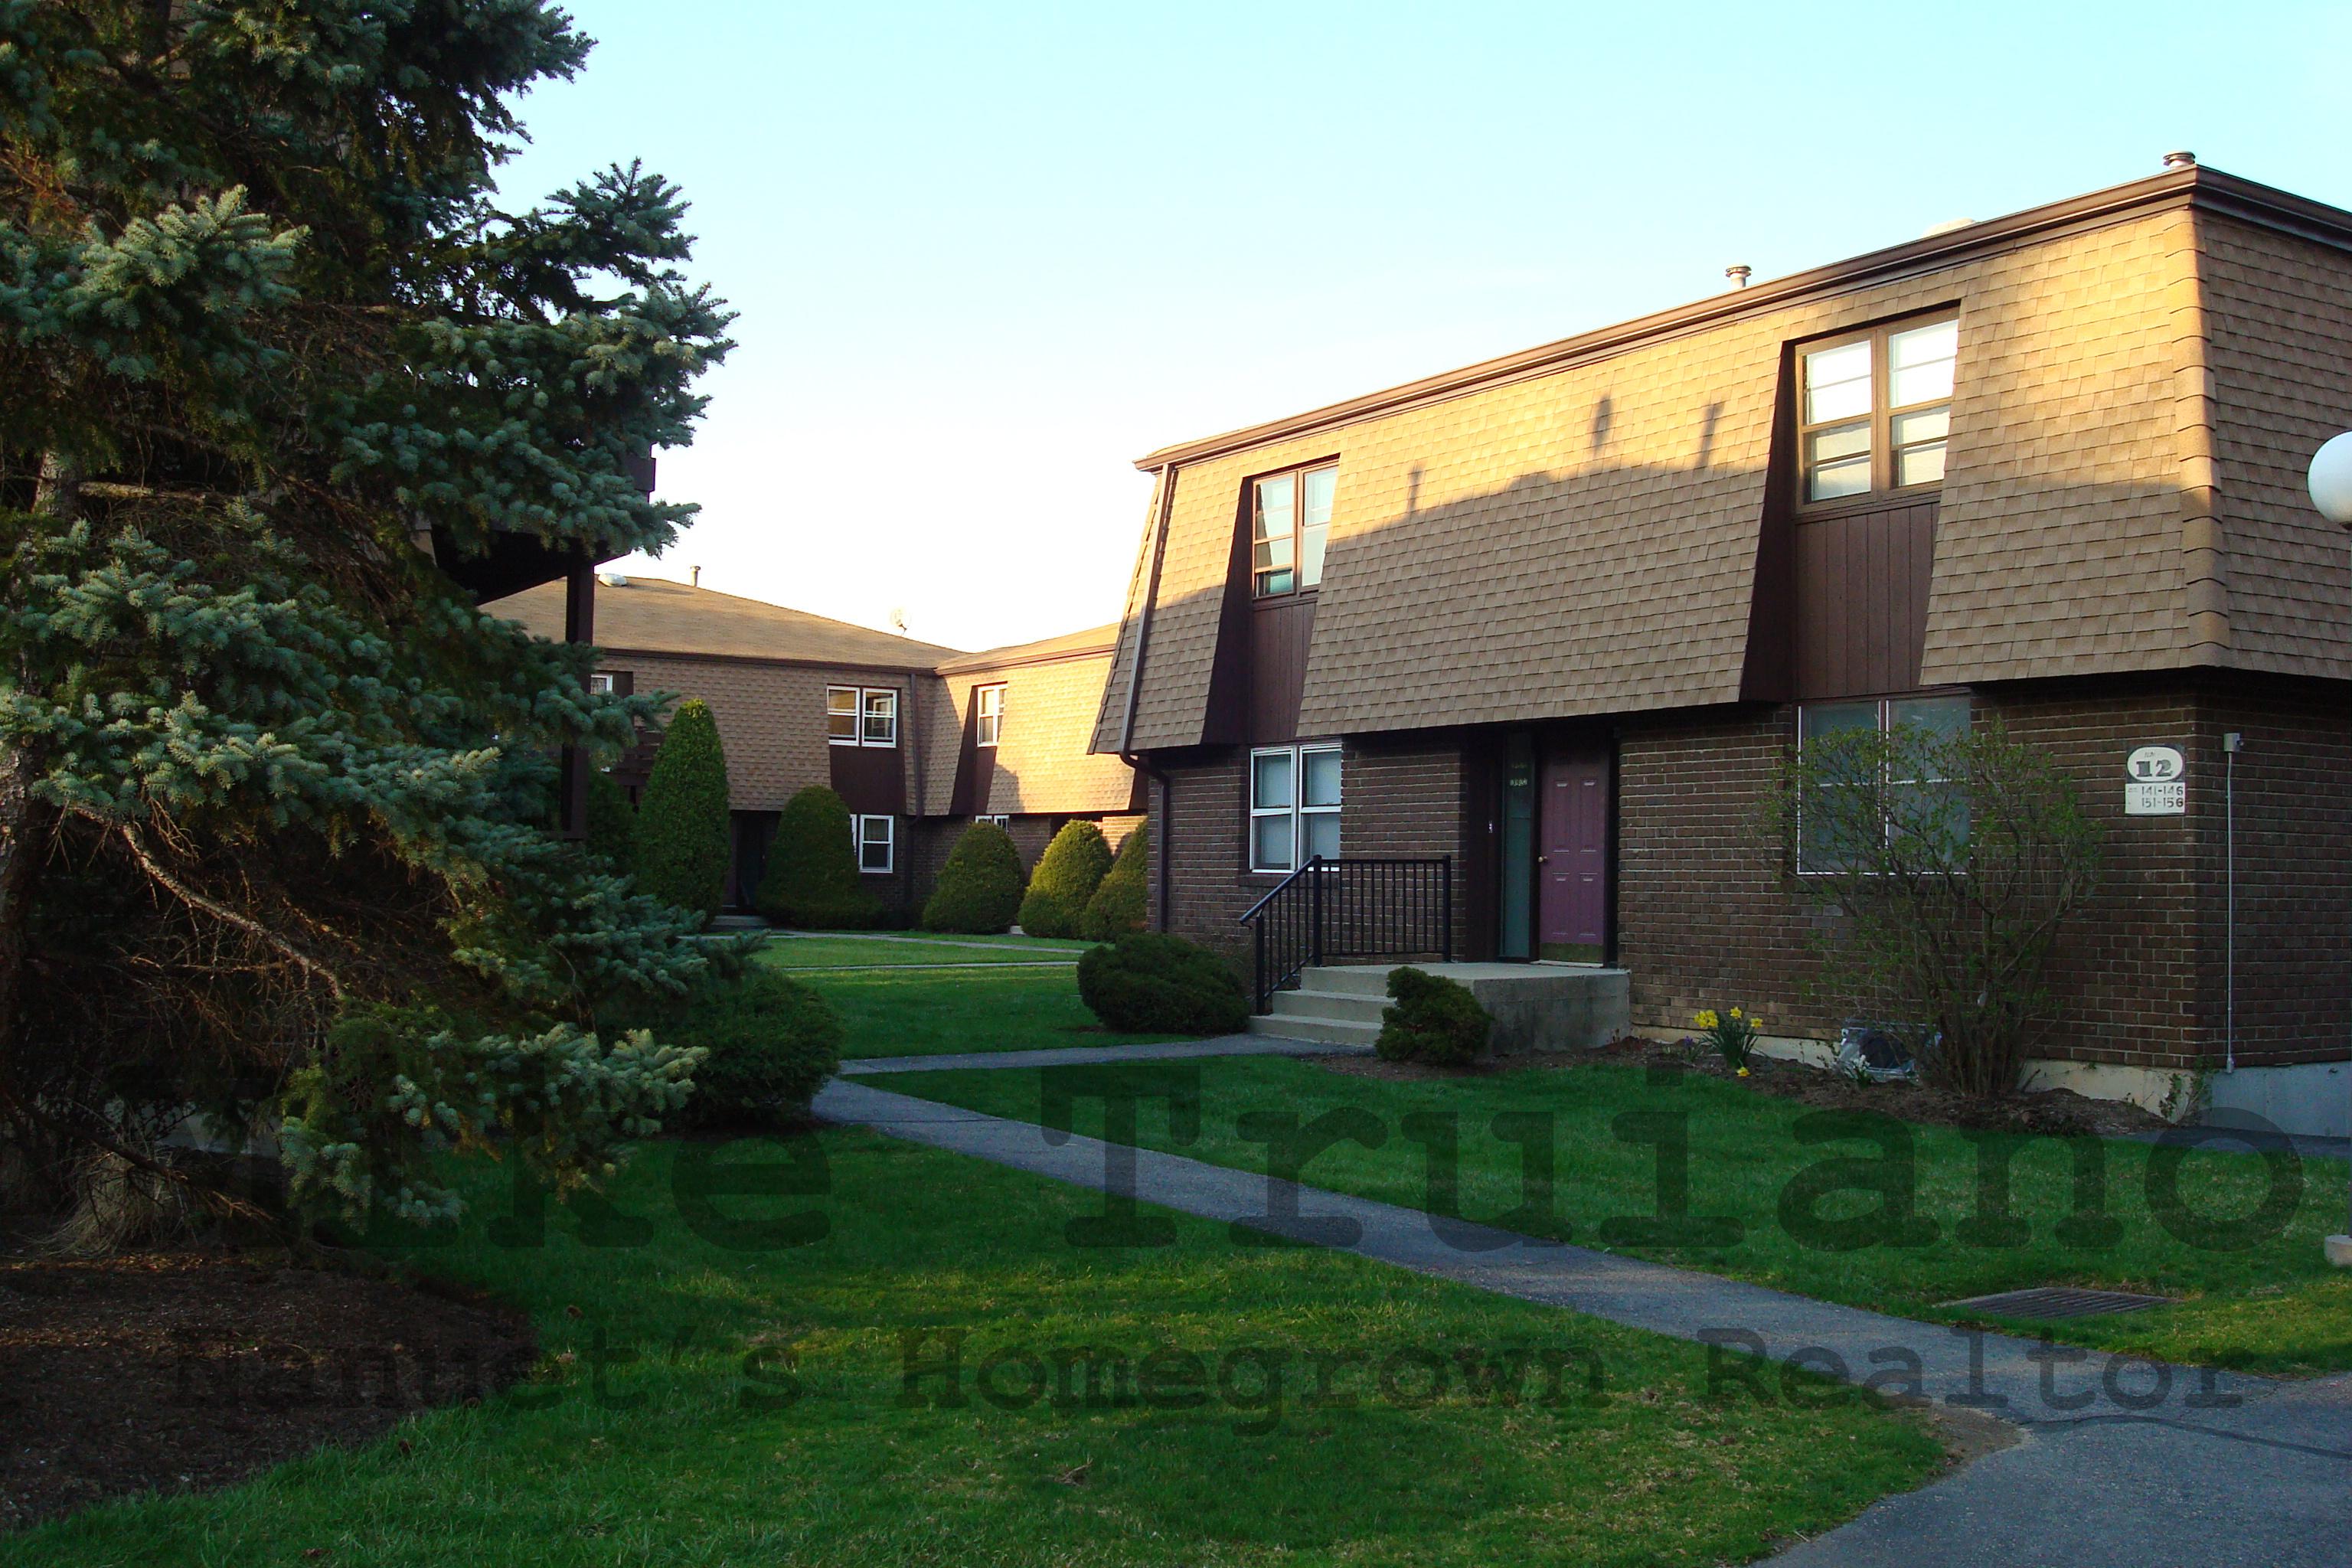 New holland village nanuet condos for sale nanuet homes and condos for Condos for sale in garden city ny